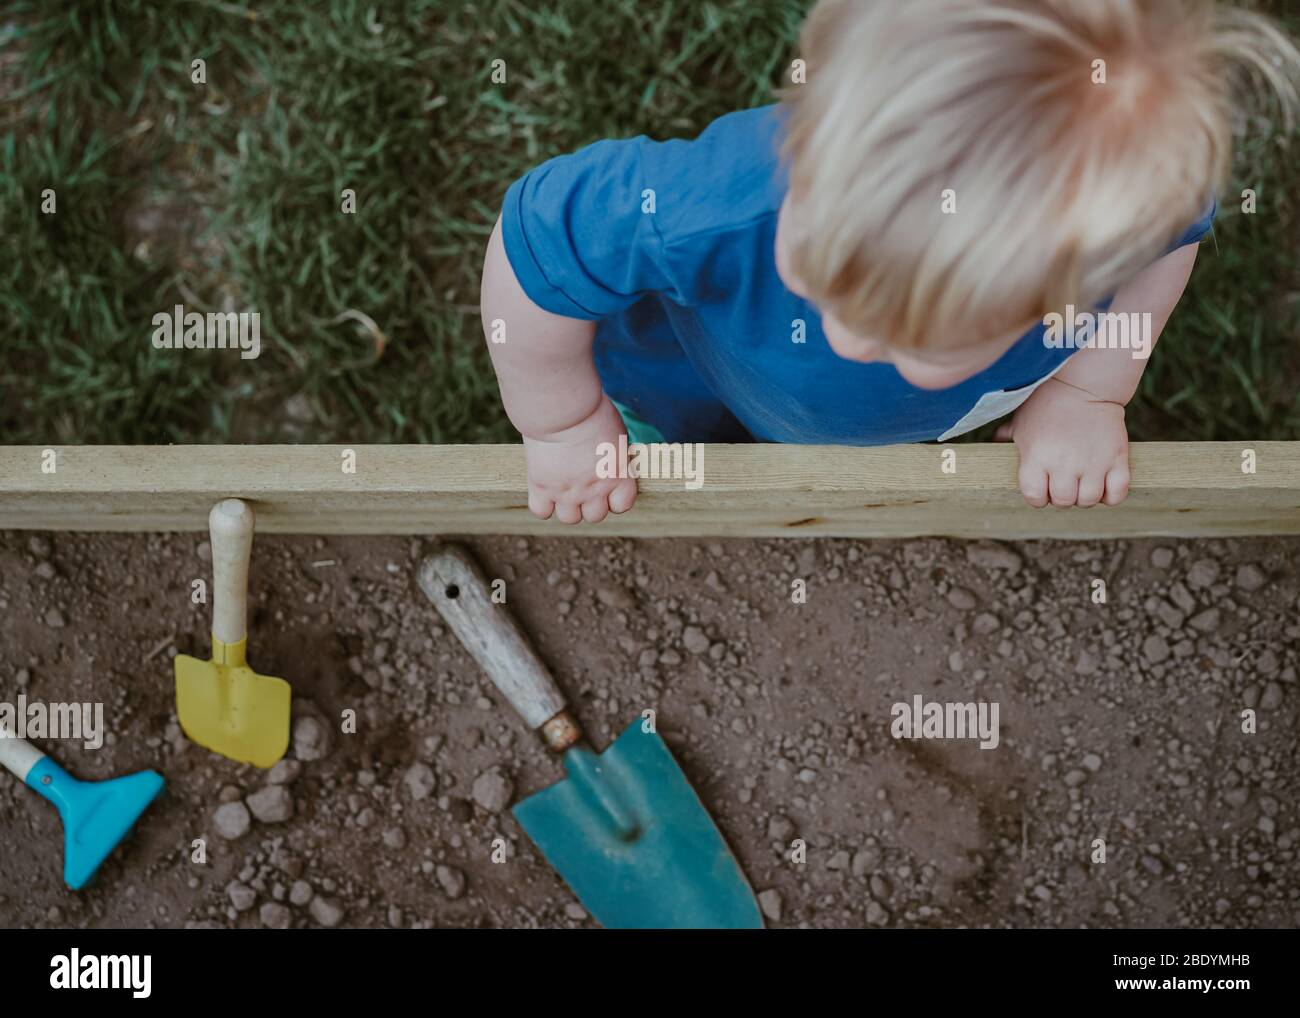 Pequeño niño niño pequeño jardín Foto de stock